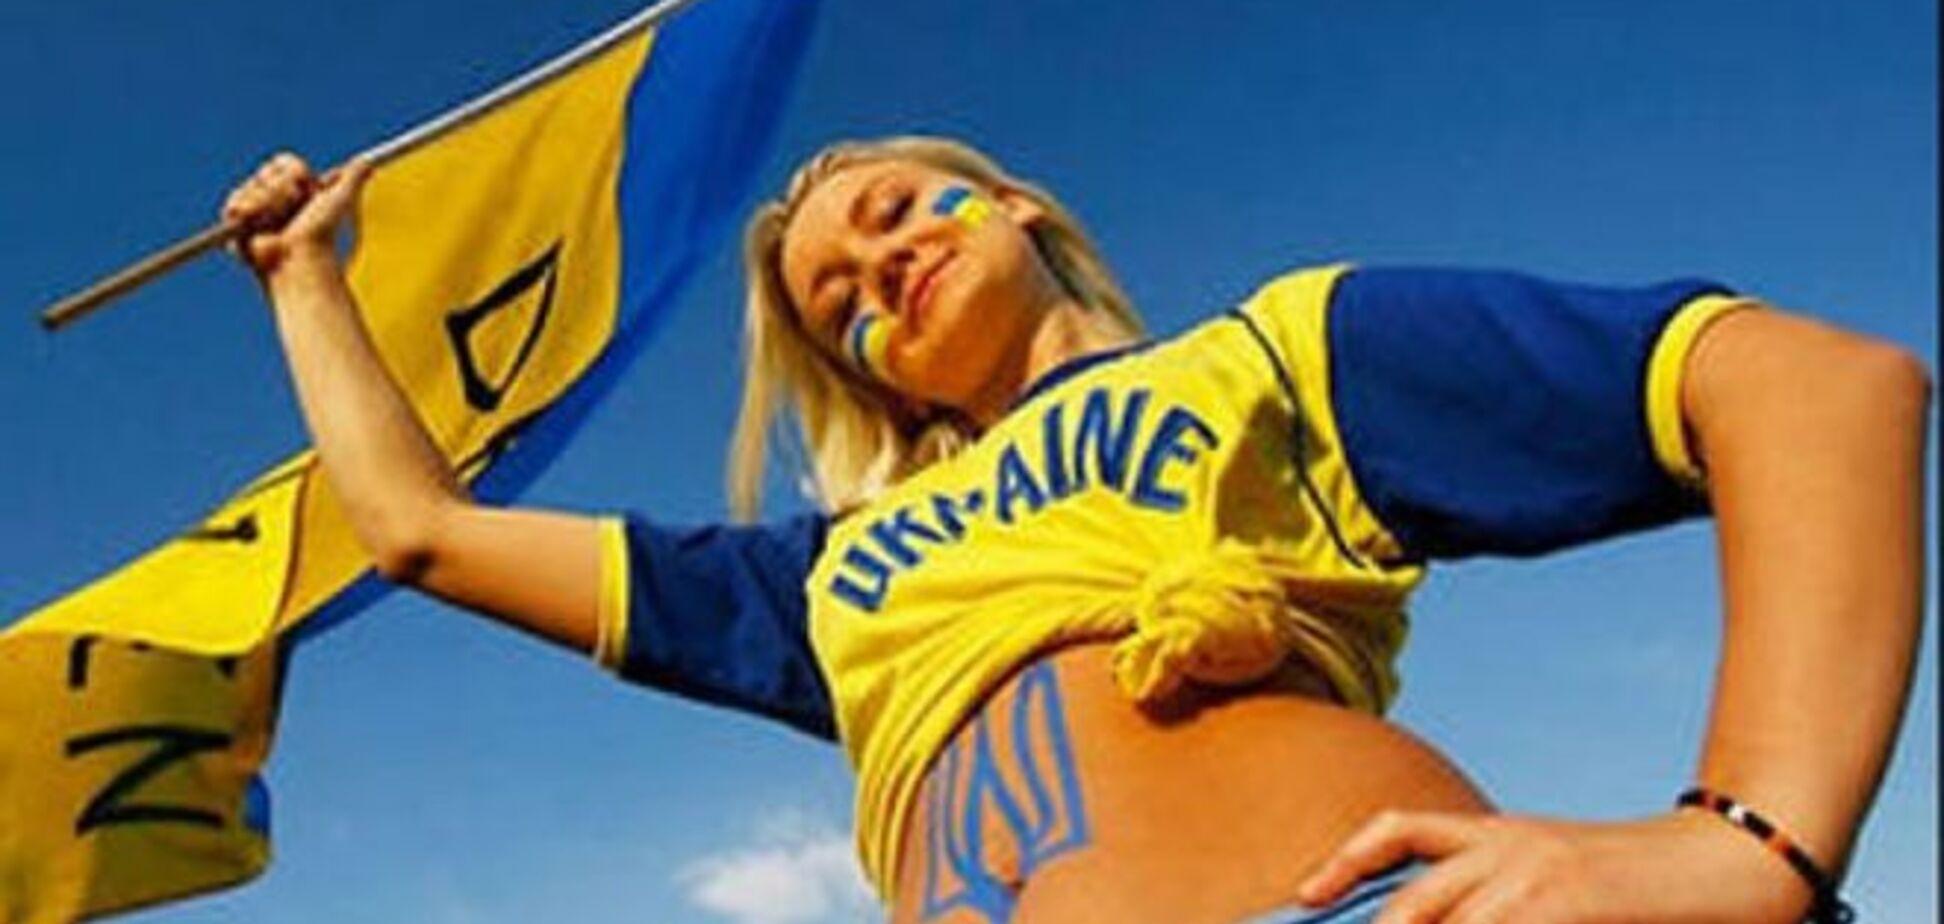 Донбассу необходима 'ласковая украинизация' - Ярош